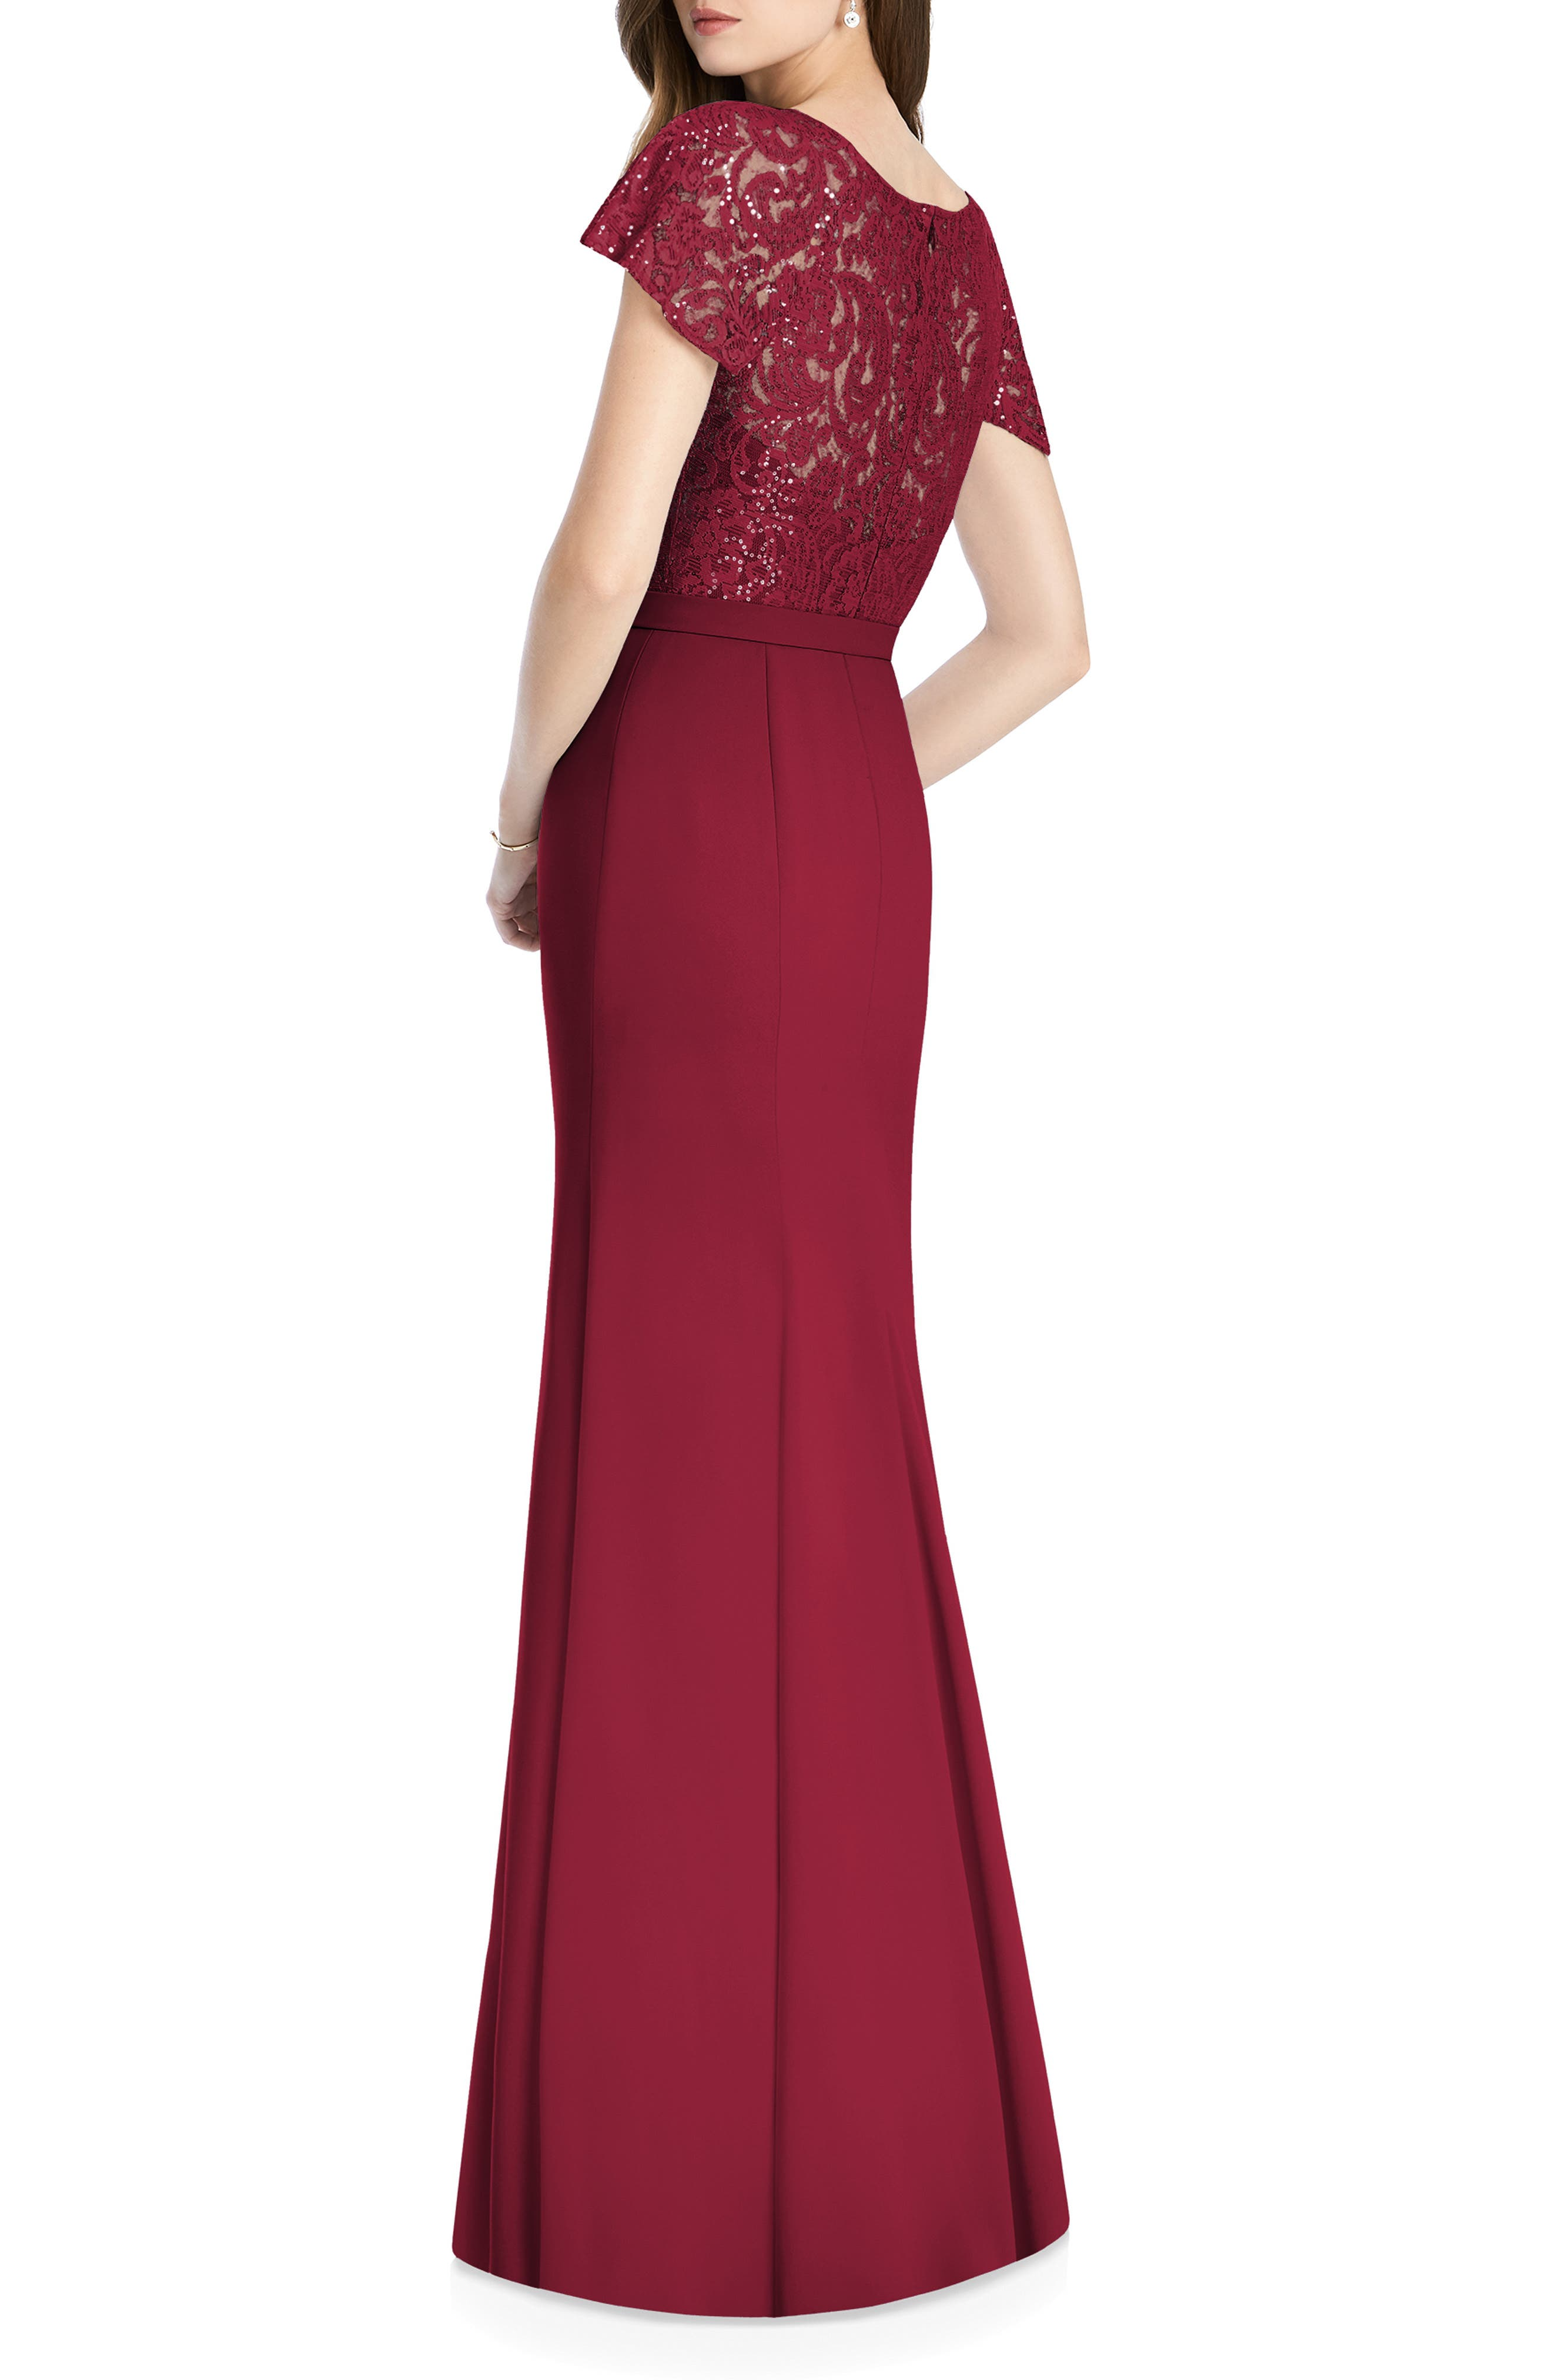 JENNY PACKHAM, Embellished Lace Gown, Alternate thumbnail 2, color, BURGUNDY